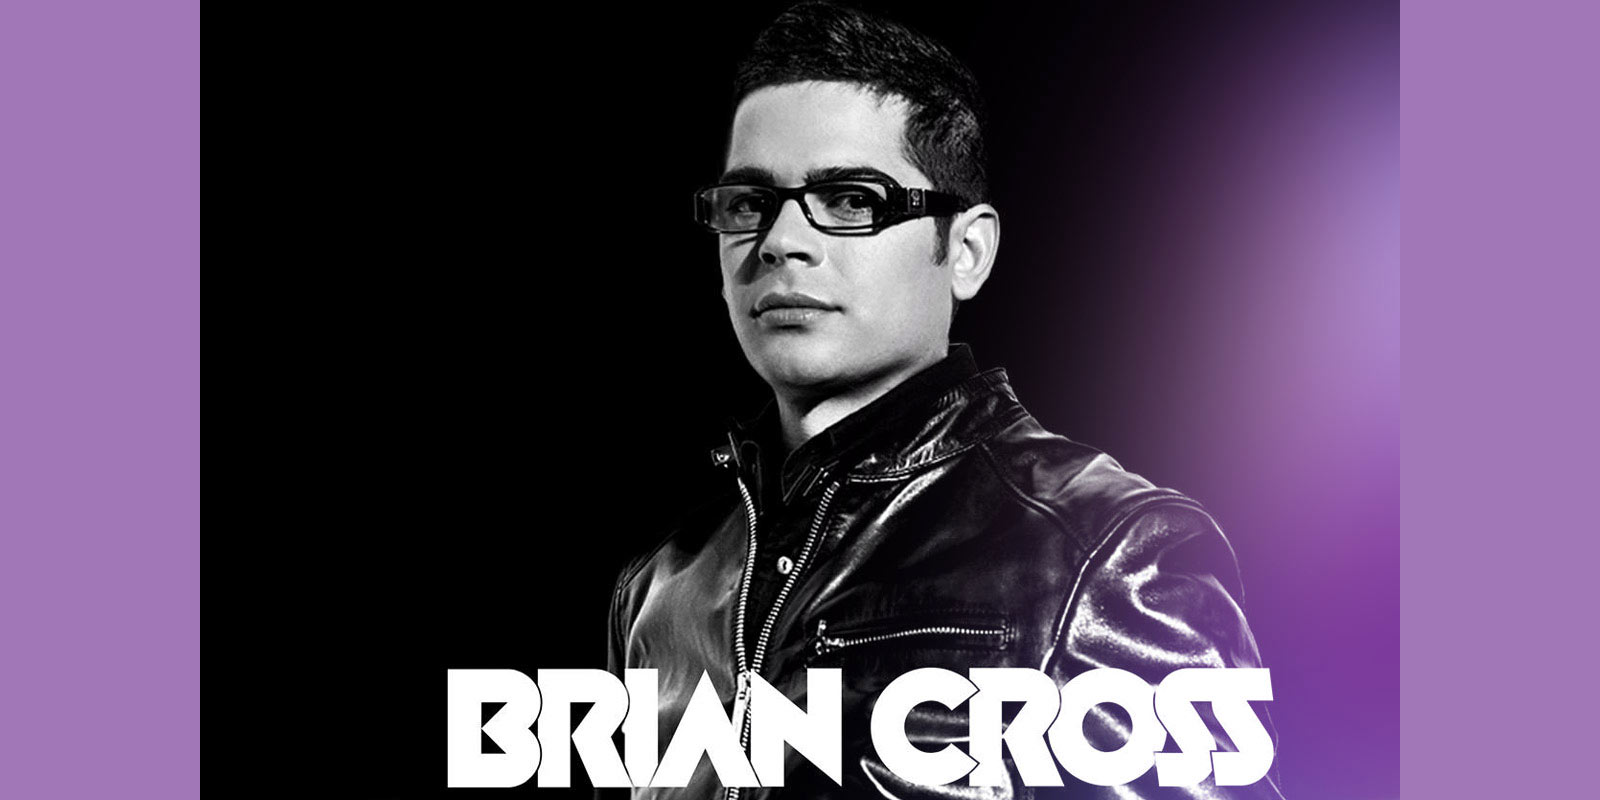 Brian Cross Valencia